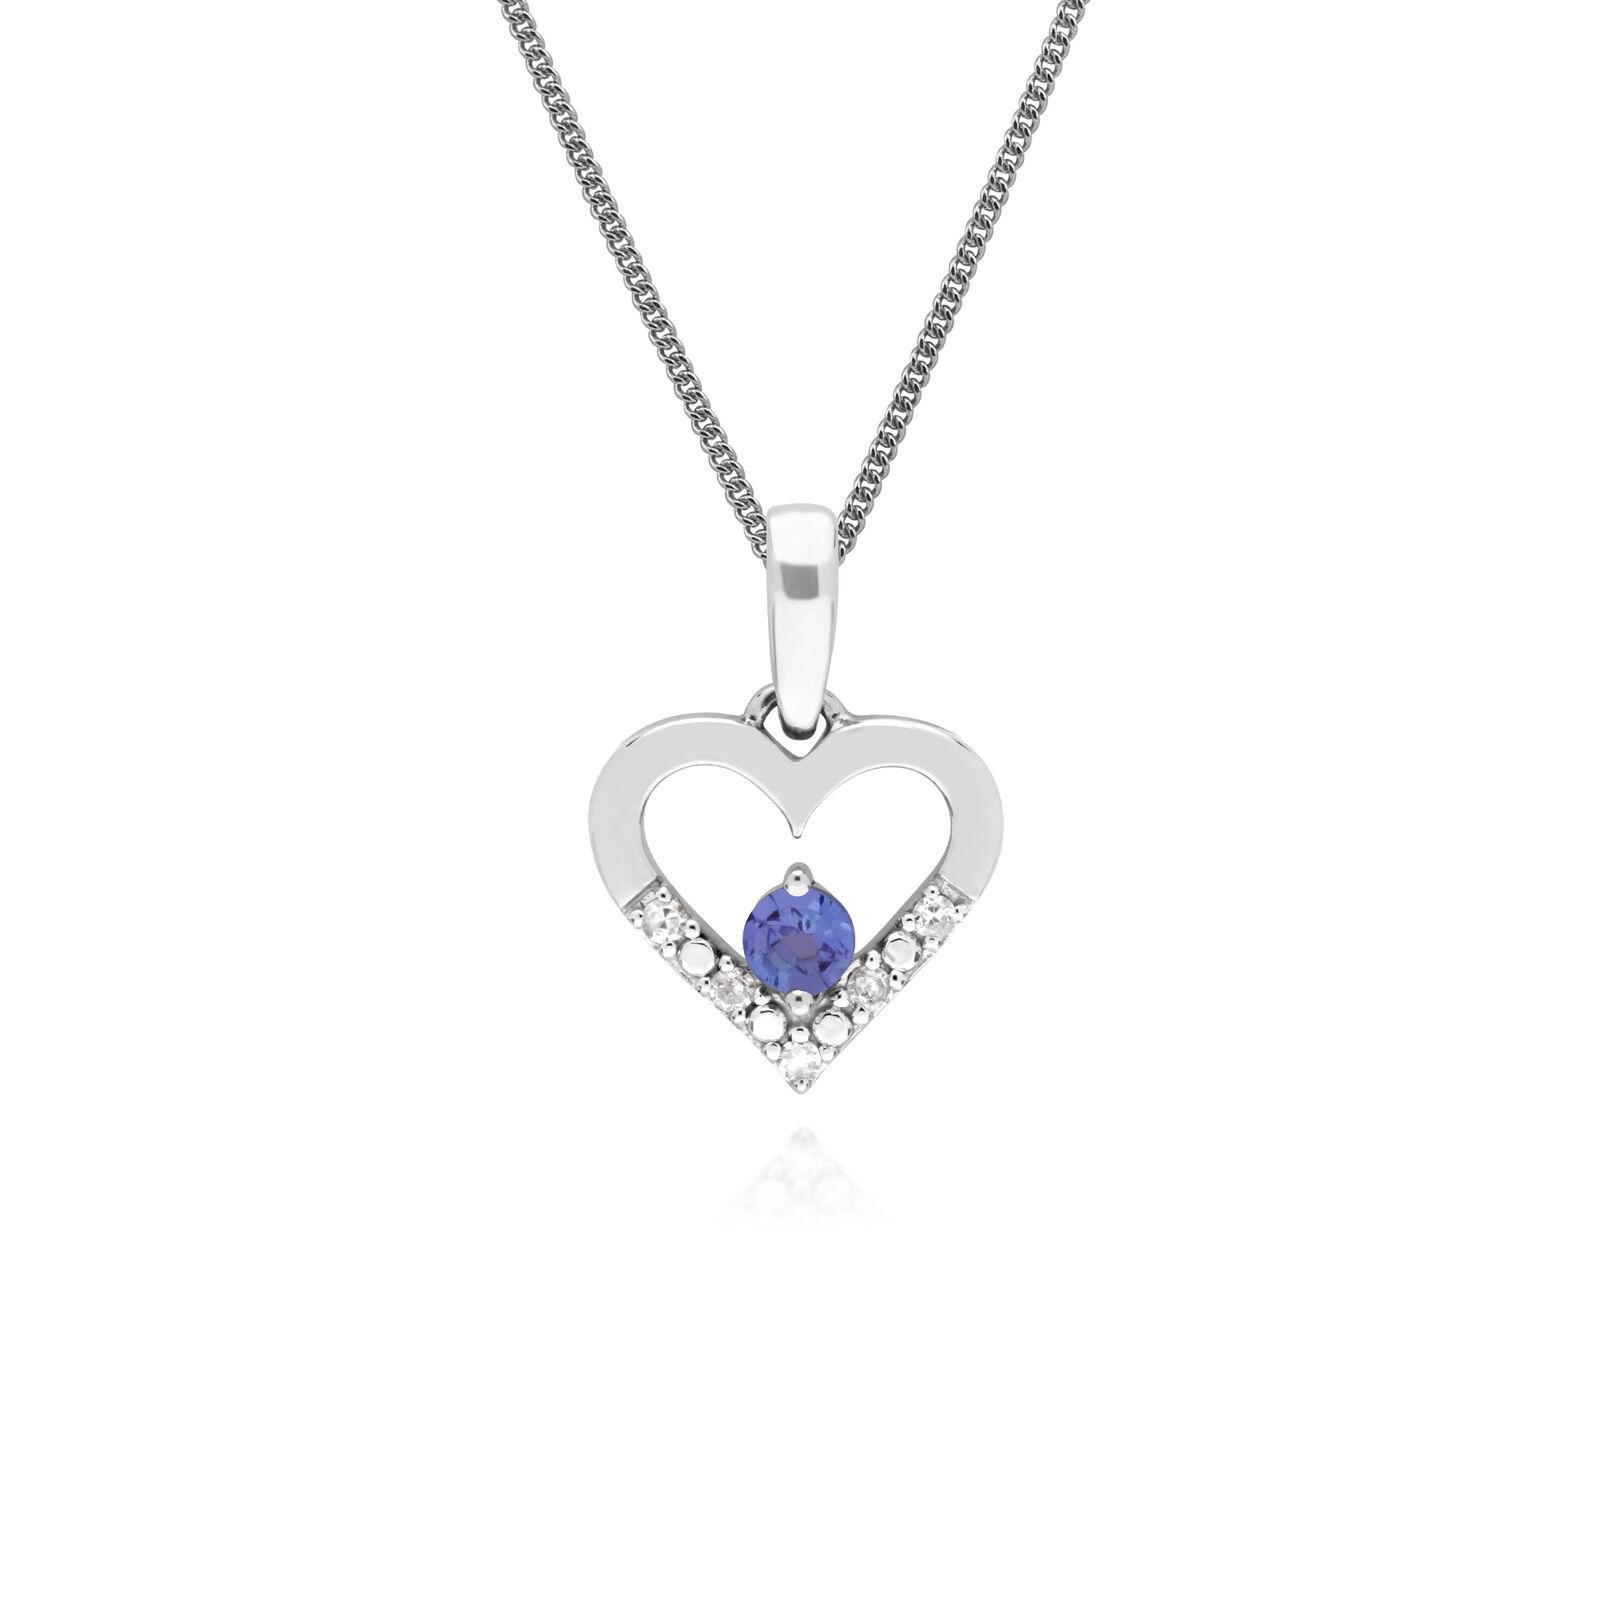 Gemondo 9ct White gold Single Tanzanite & Diamond Heart Pendant on 45cm Chain